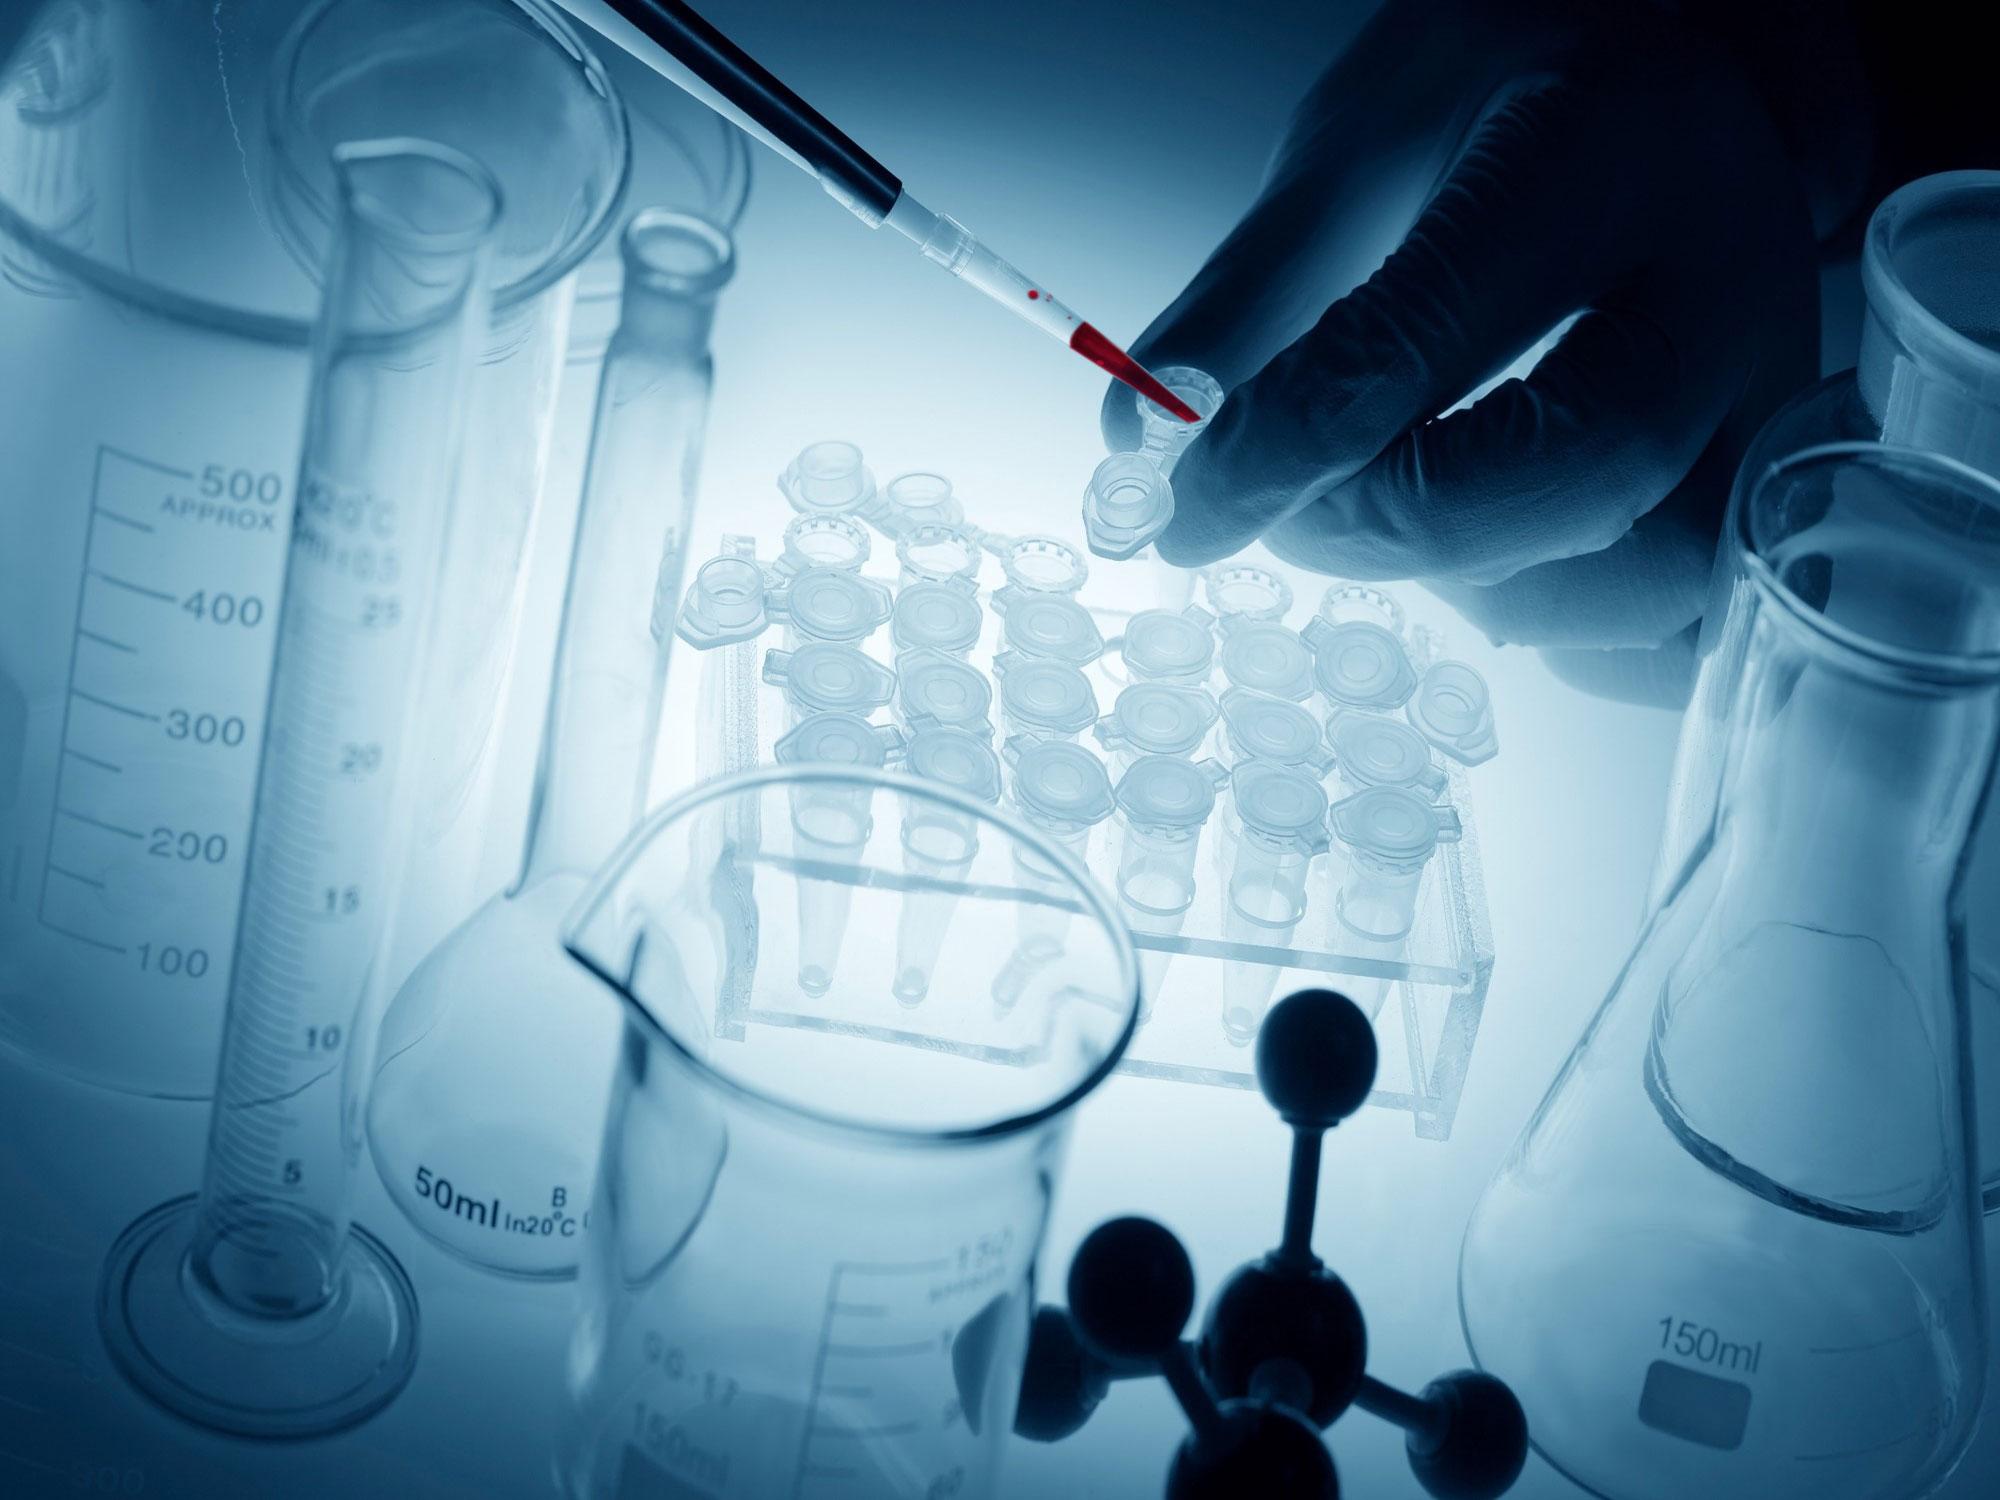 Laboratory – CoreMedicaLabs